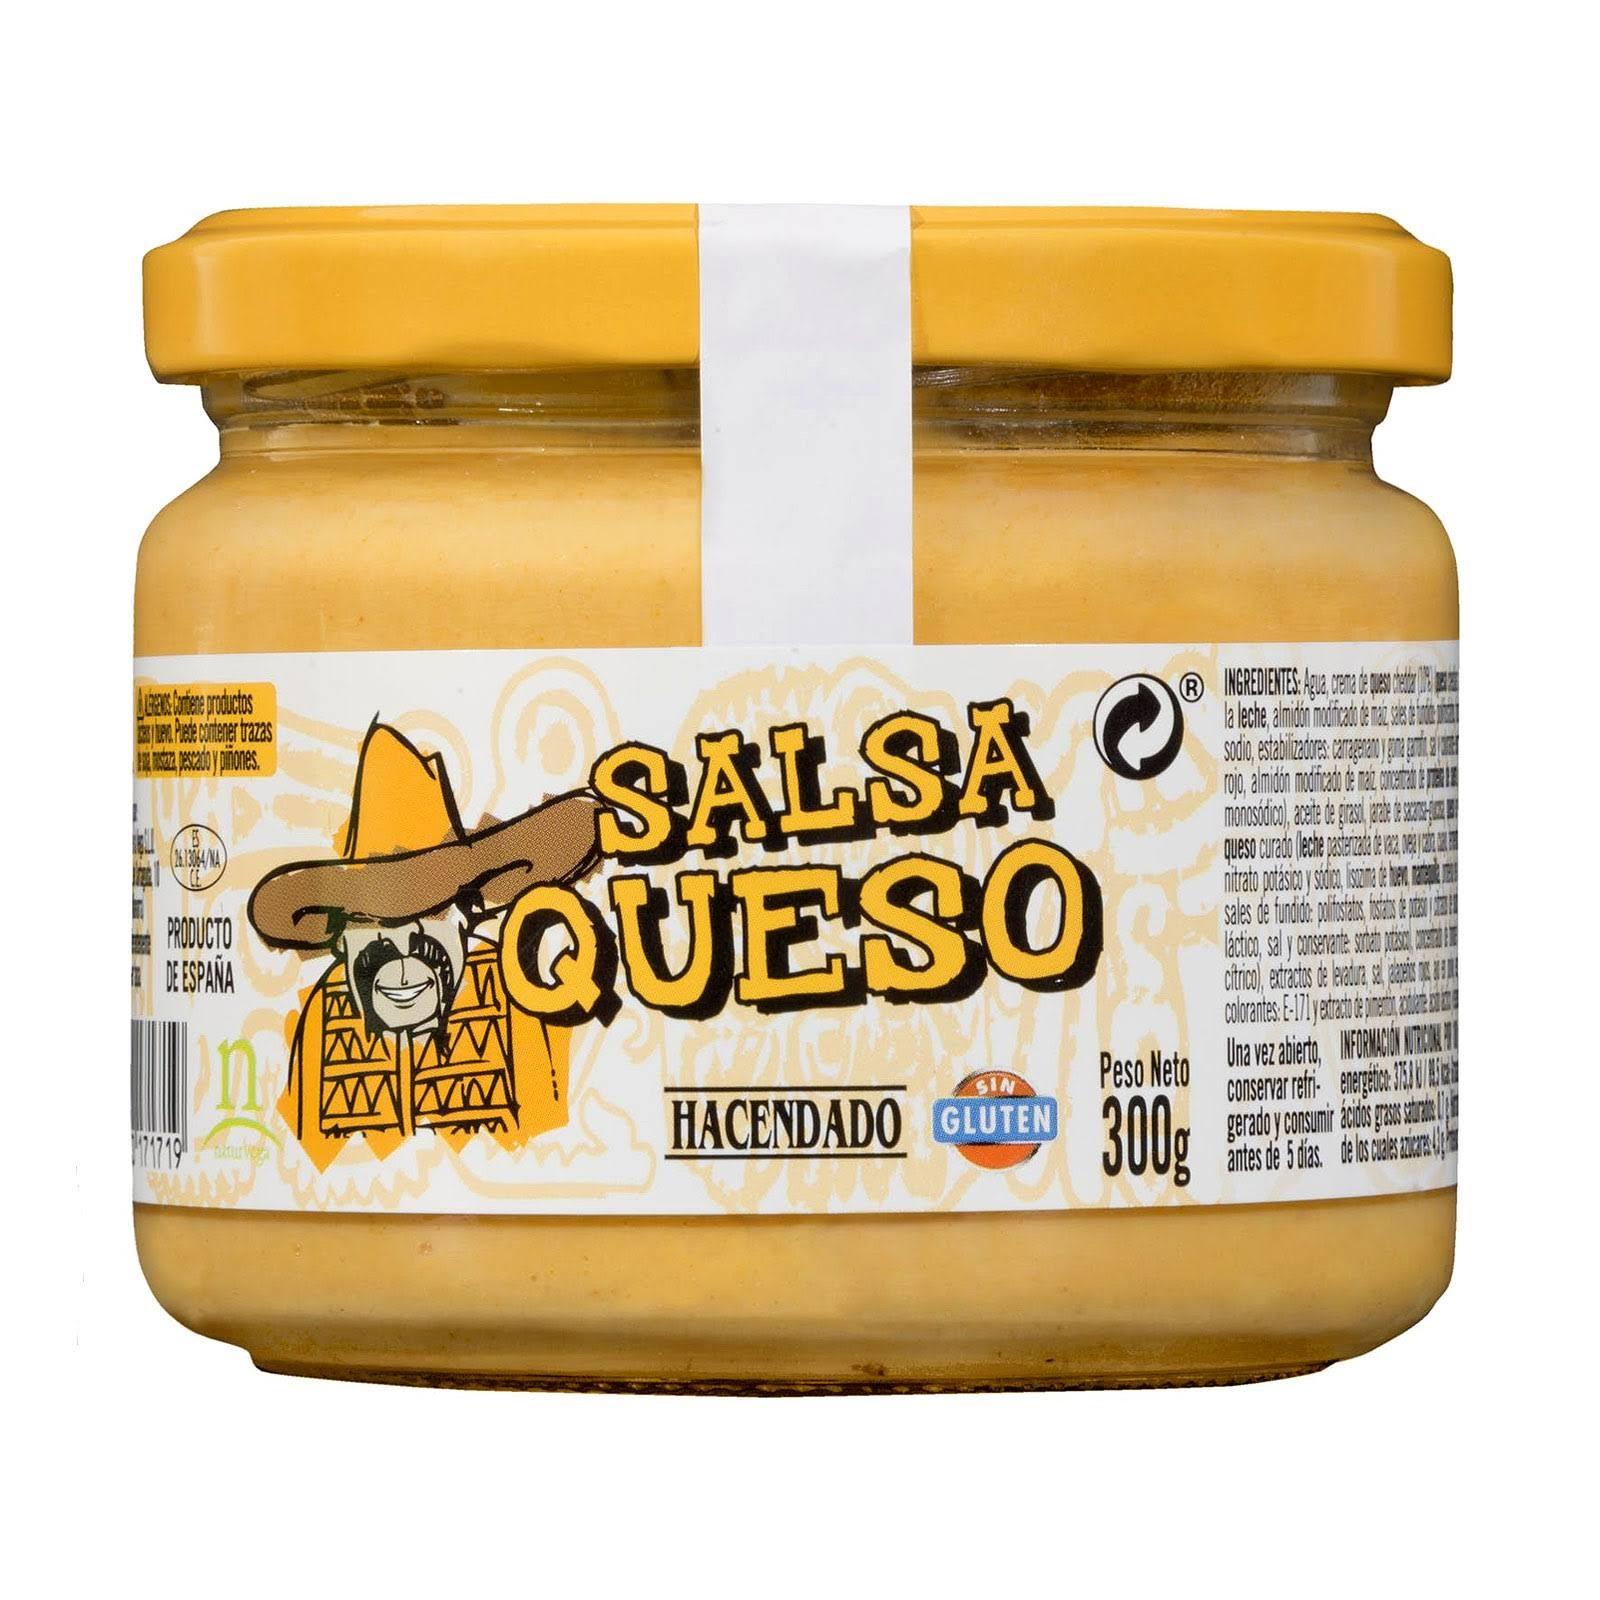 salsa-de-queso-para-dipear-hacendado-mercadona-1